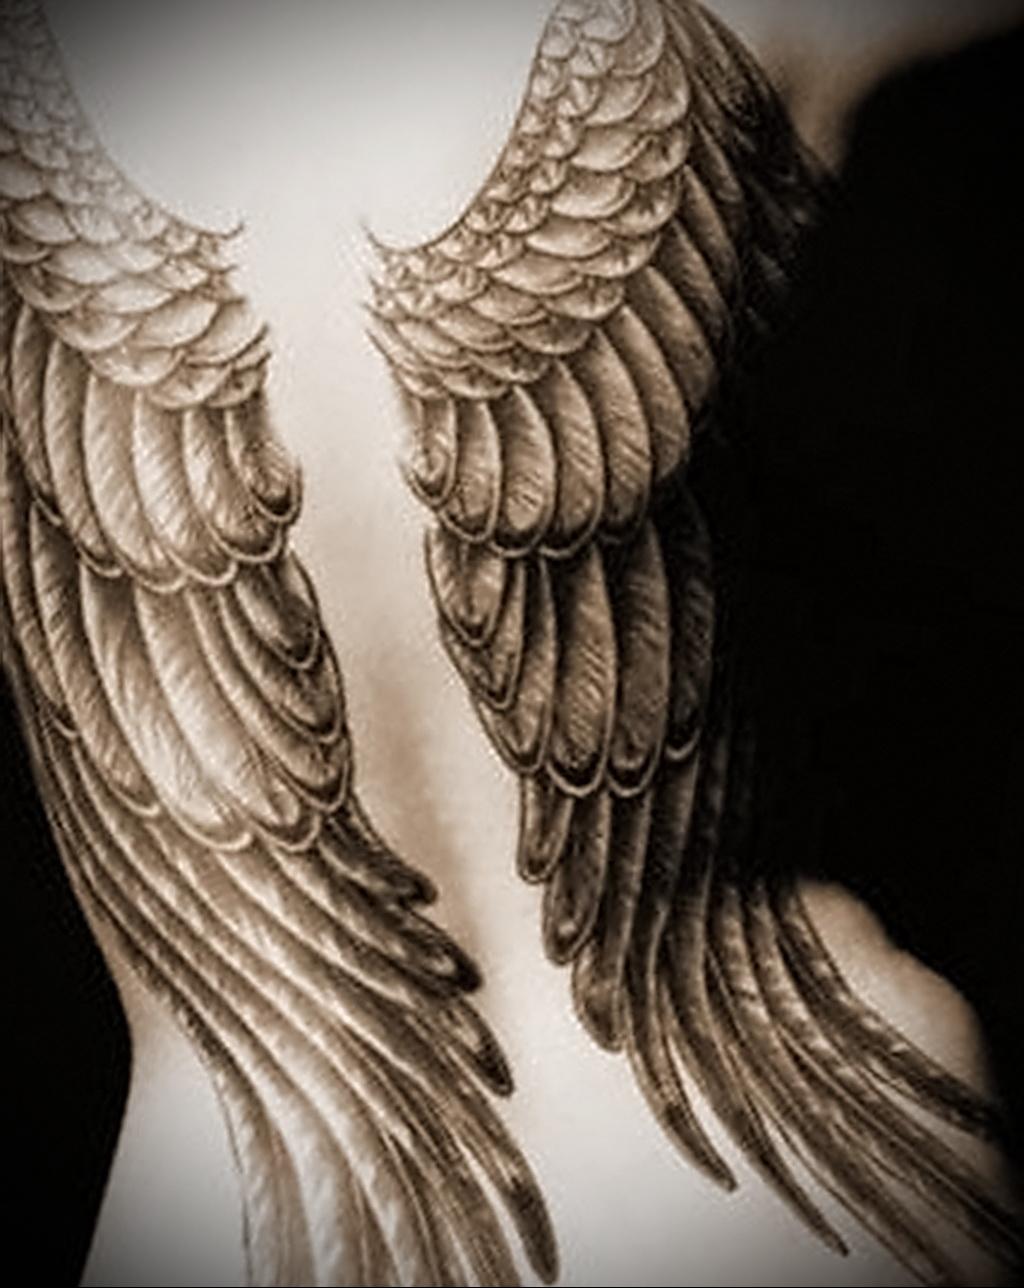 Читать онлайн  Браун Дэн Ангелы и демоны  Электронная